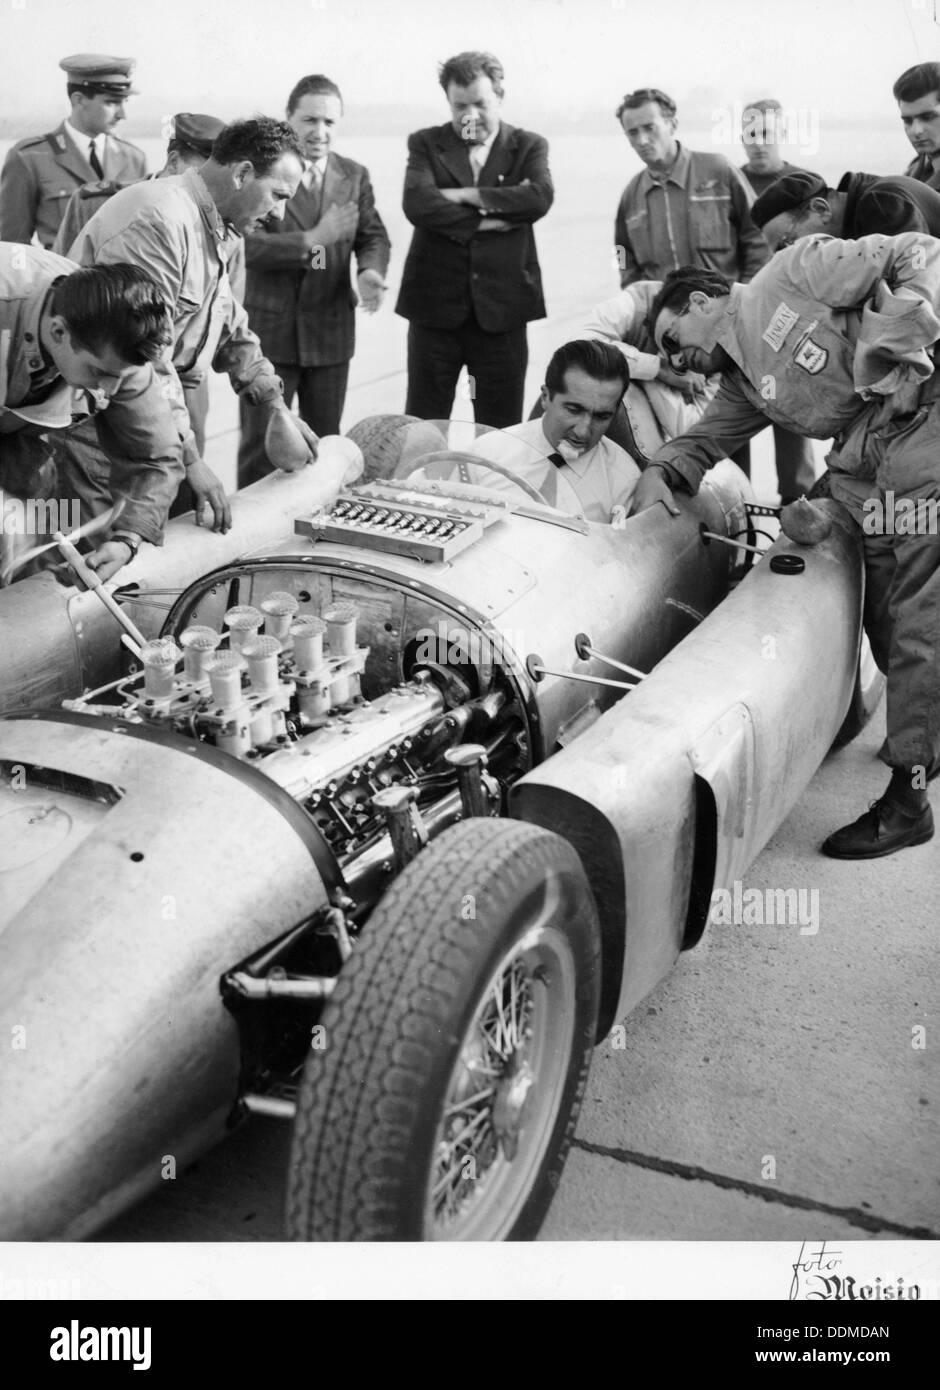 Alberto Ascari at the wheel of the new Lancia Grand Prix car, 1955. - Stock Image